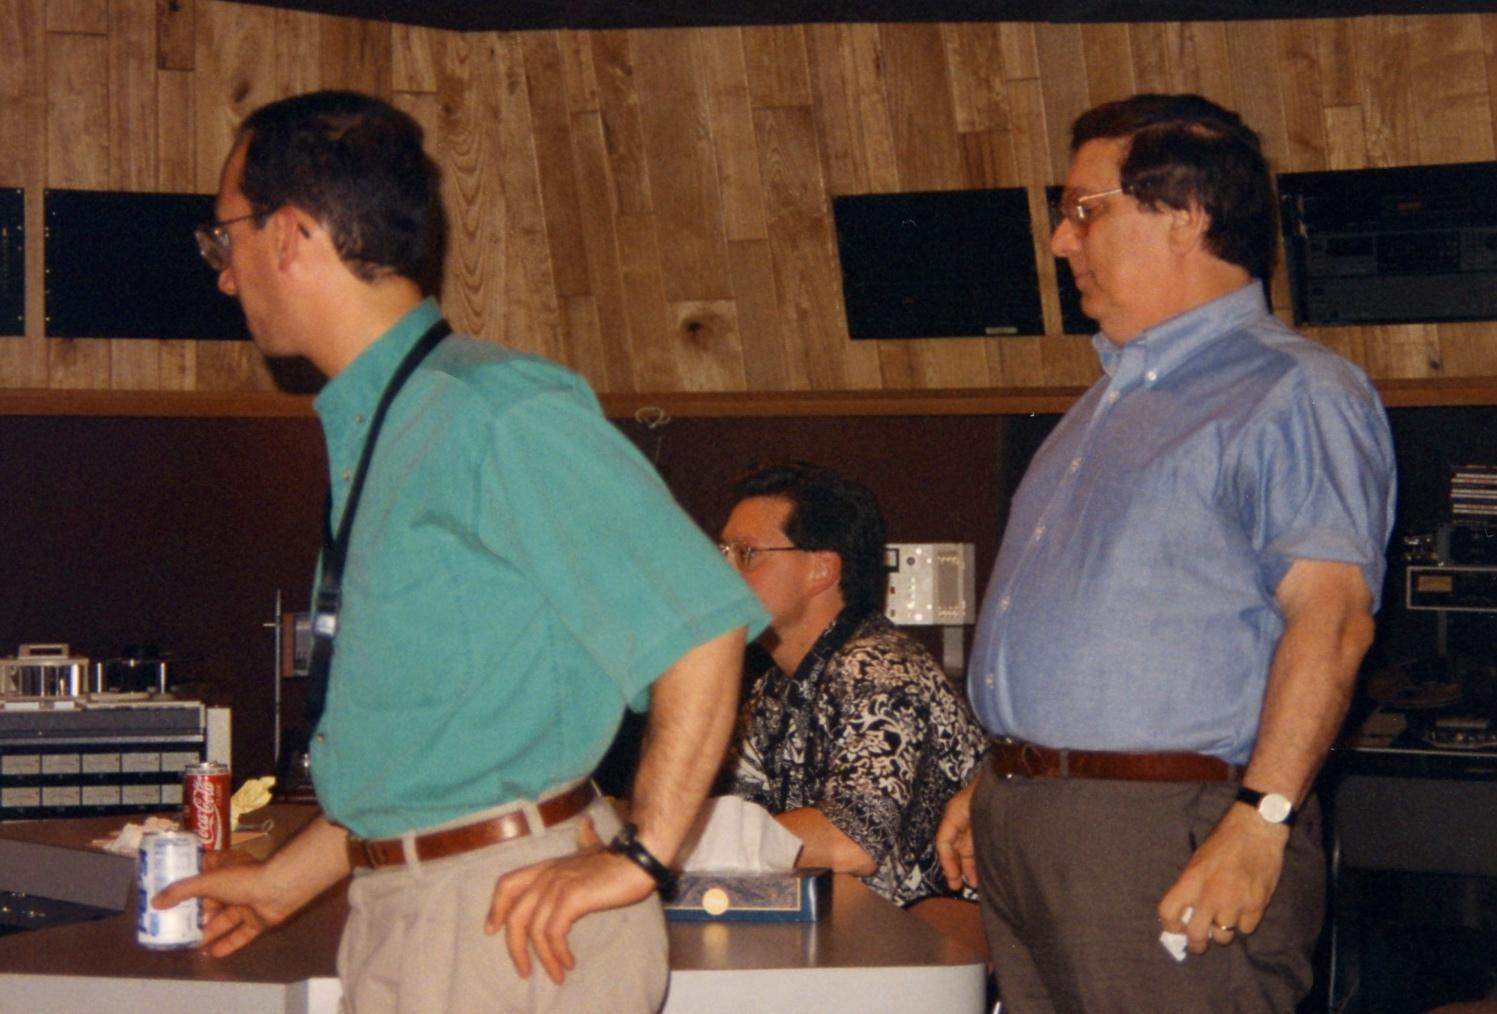 1994-06-20 SESSIONS (17).jpg